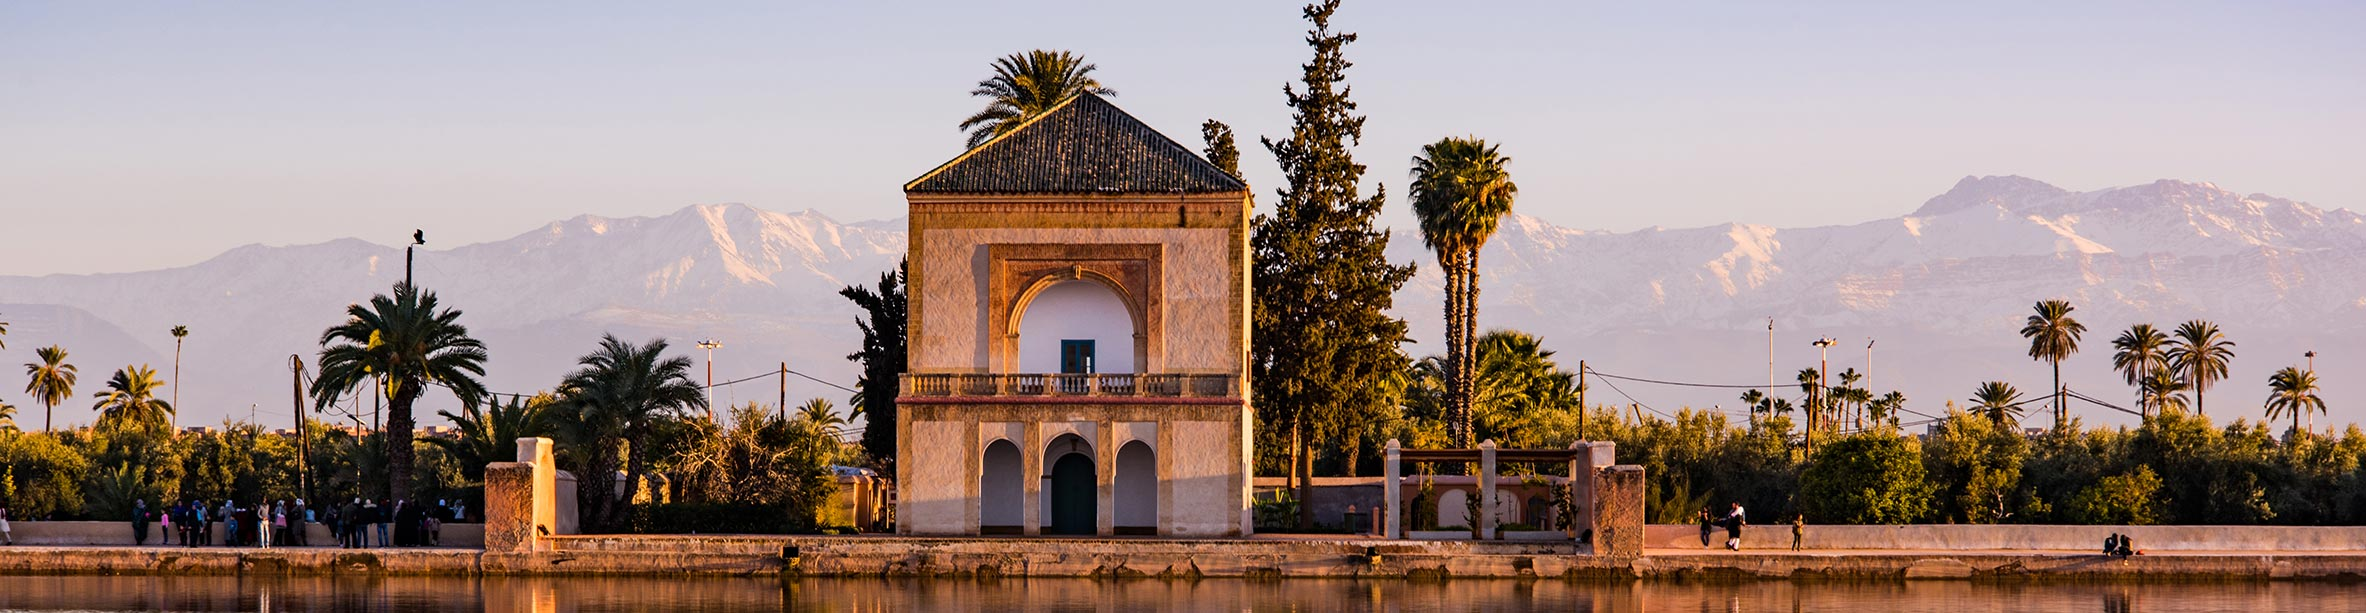 Giardini Menara, Marrakech - Marocco